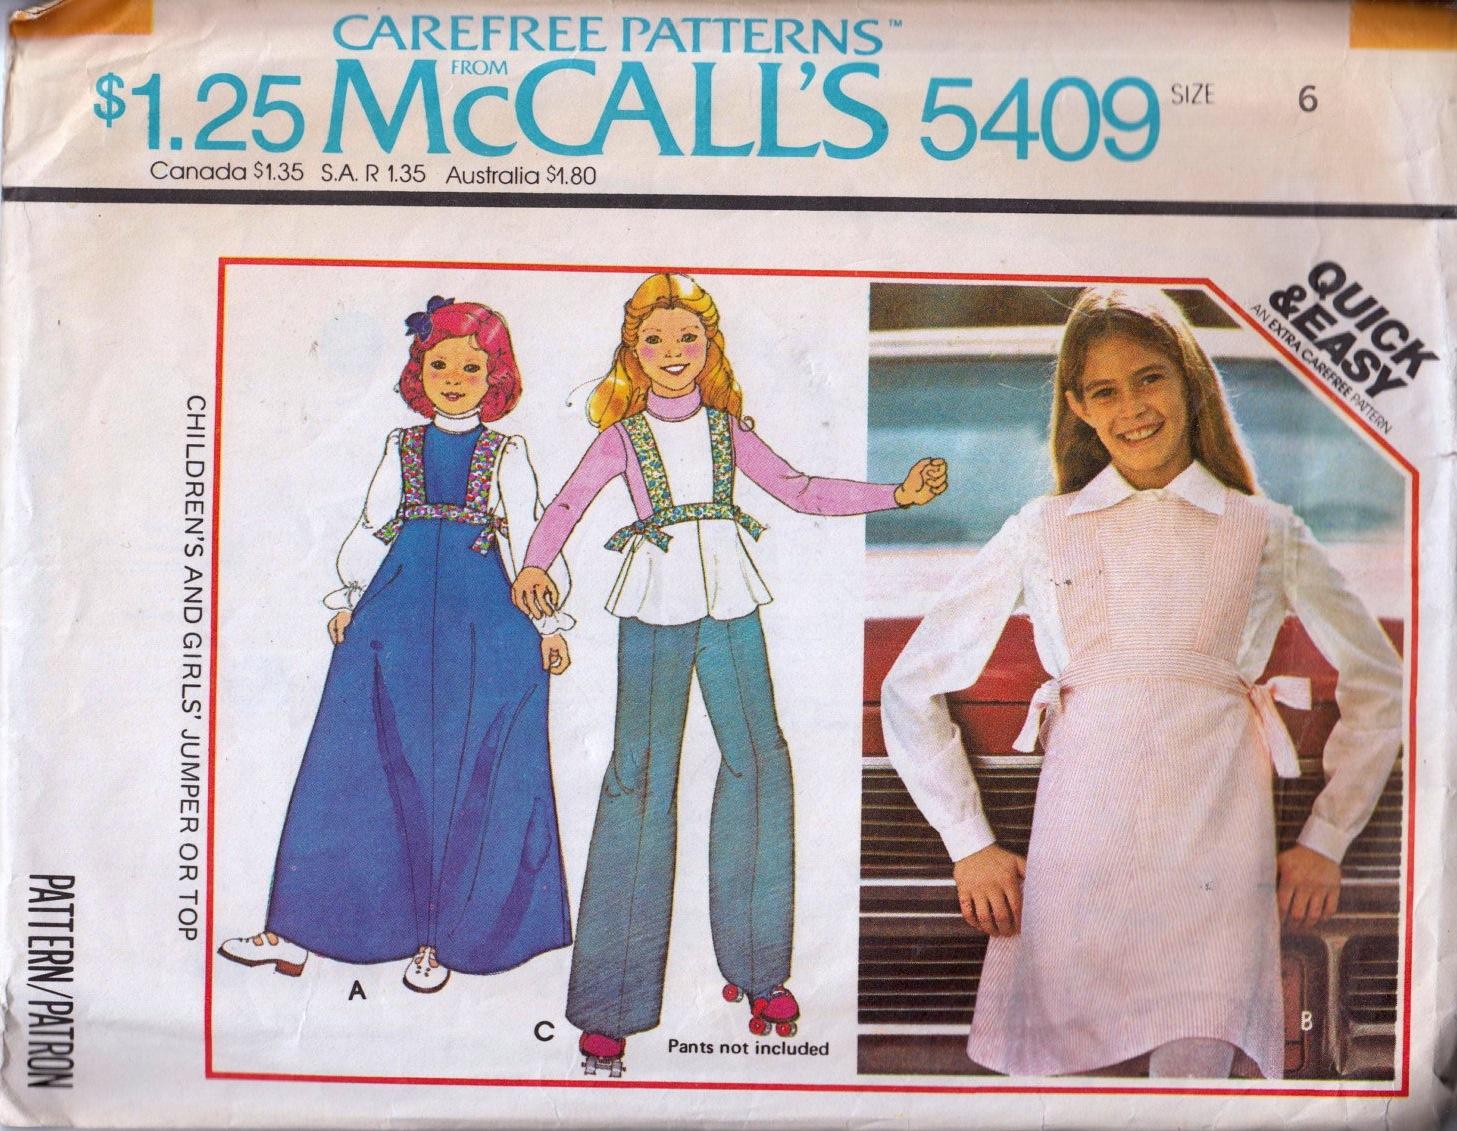 McCall's 5409